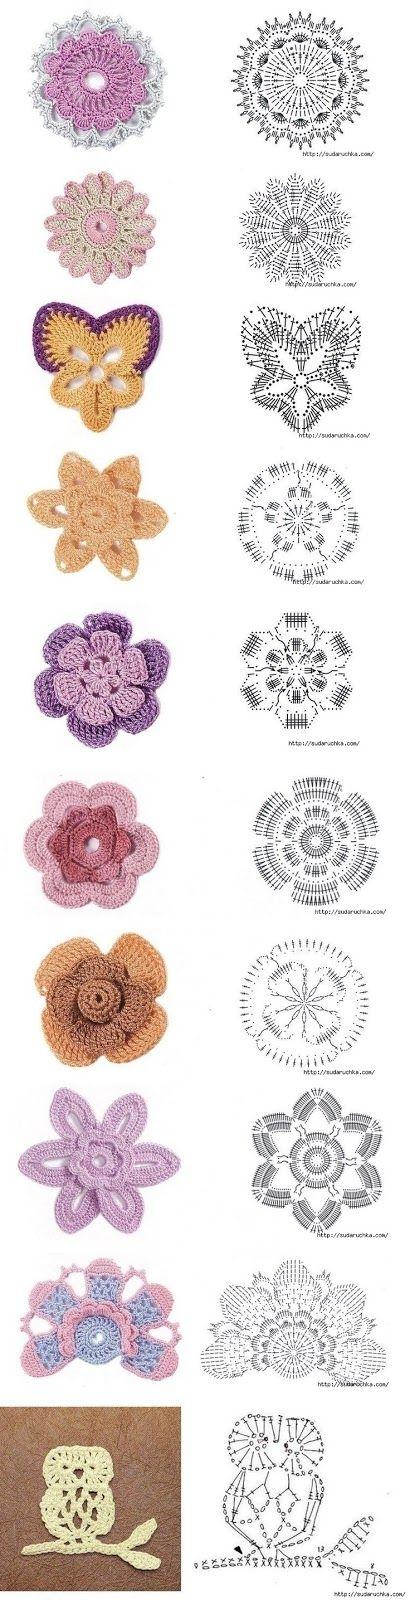 Tejido Facil: Patrón: muchas flores y buho! / Pattern: Many flow ...